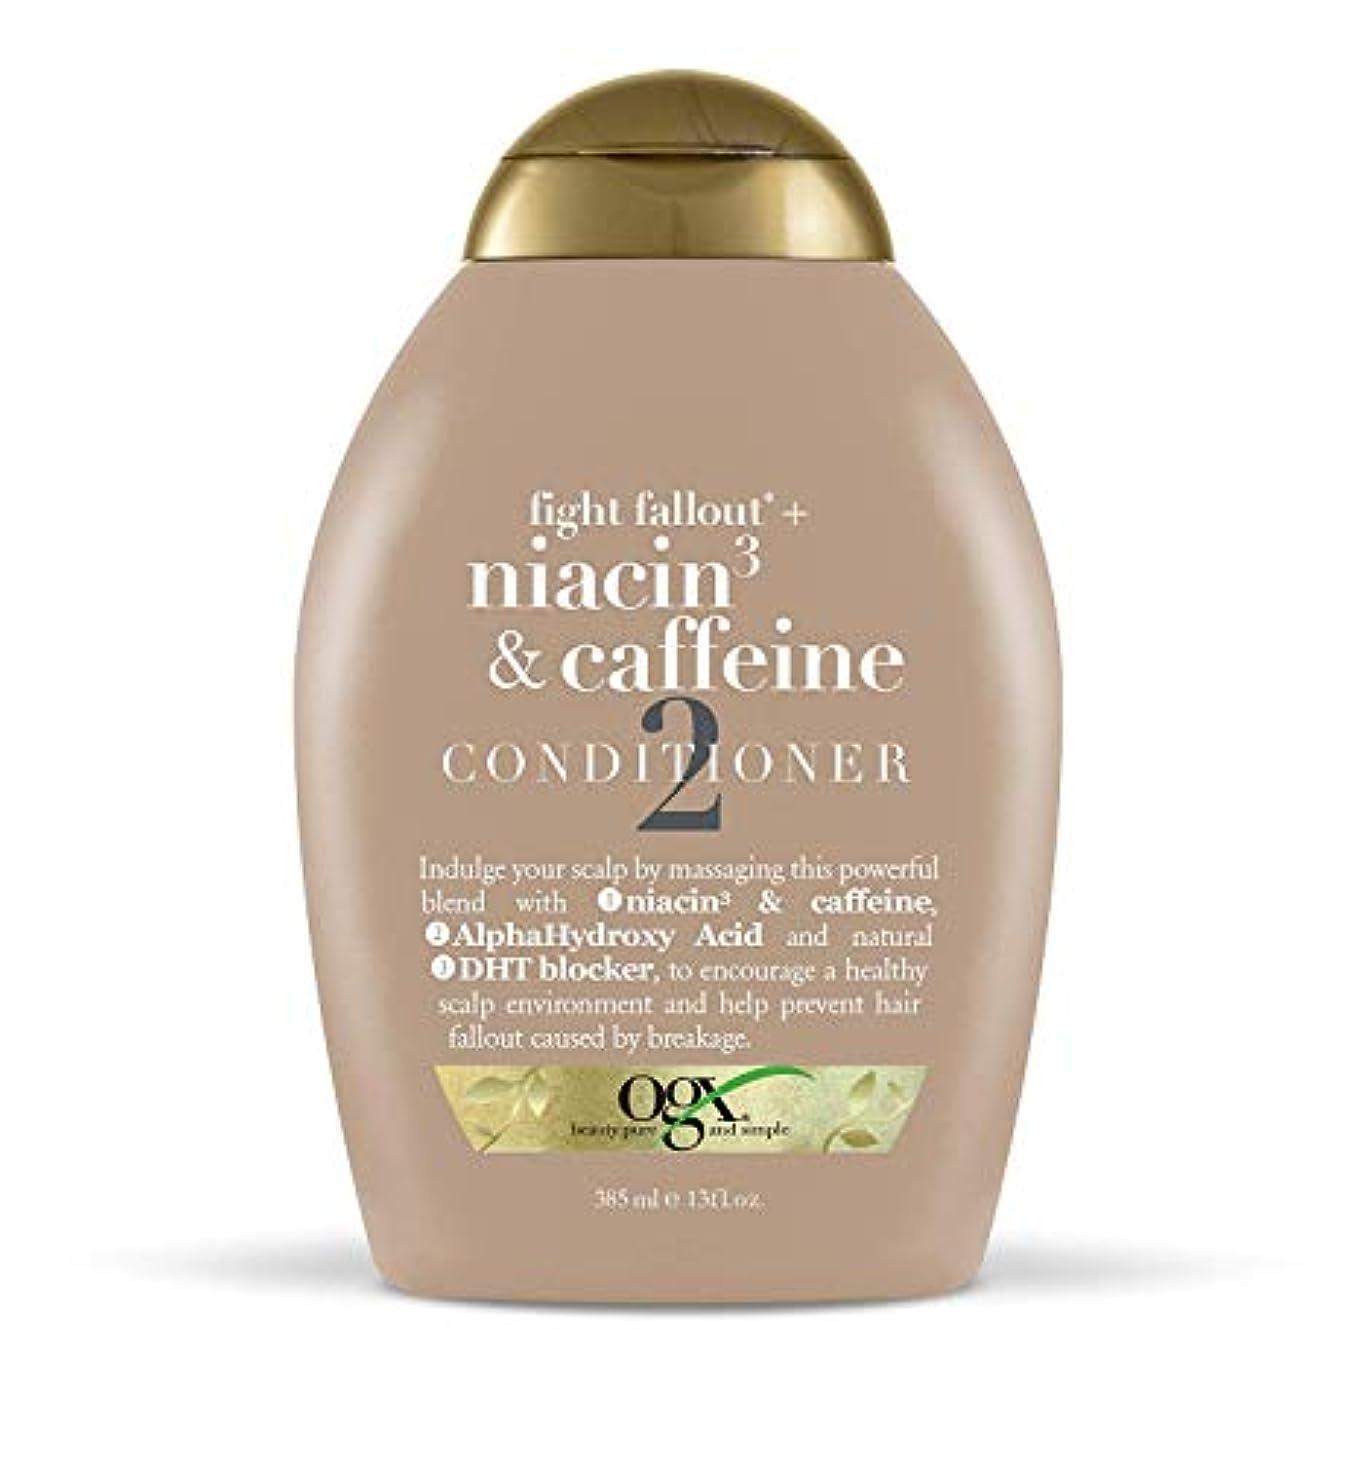 OGX Conditioner Niacin 3 & Caffeine 13oz コンディショナー ナイアシン 3 & カフェイン 385 ml [並行輸入品]